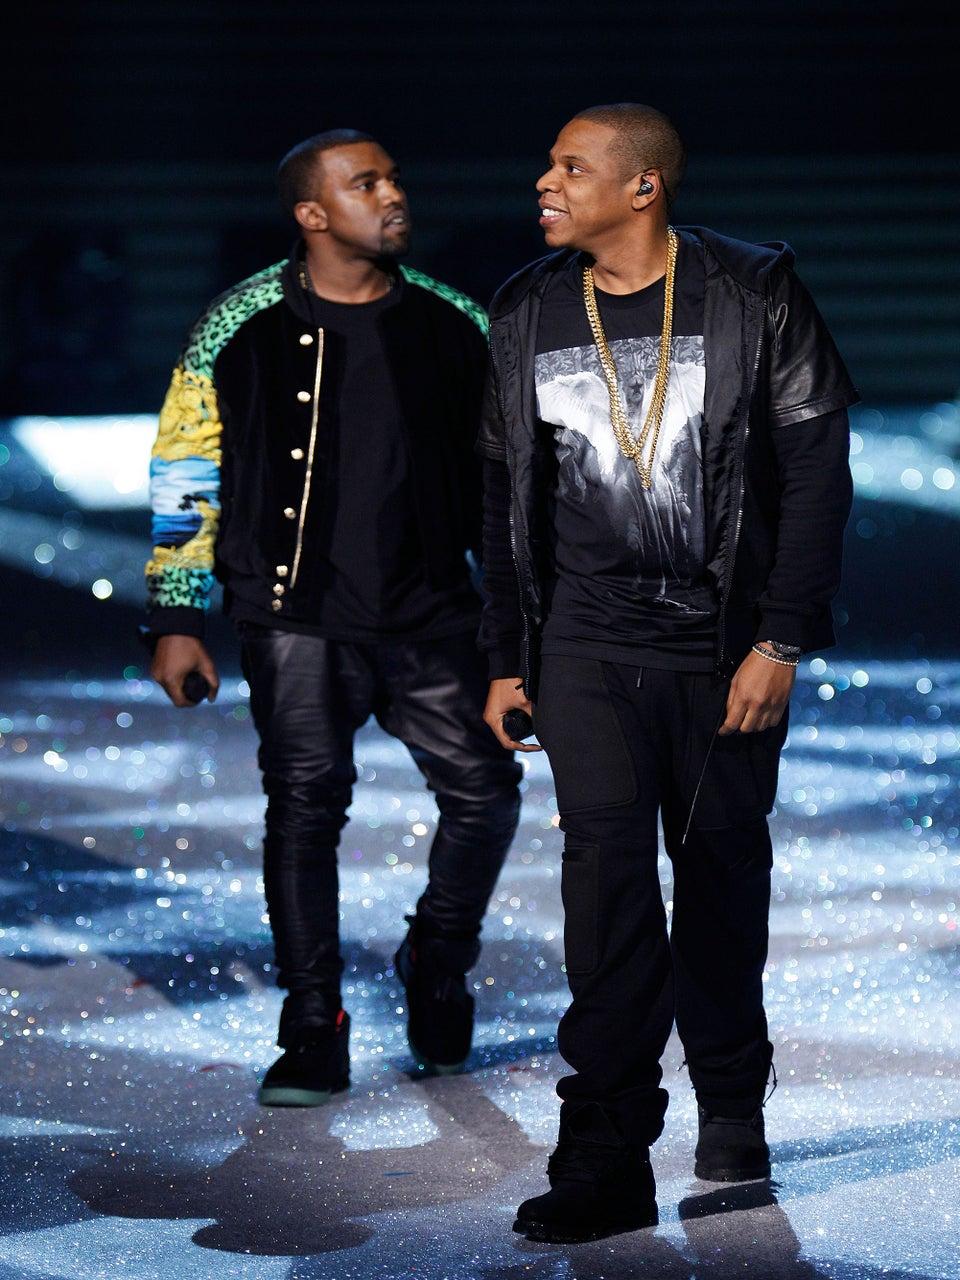 Watch The Trailer For Public Enemies: JAY-Z Vs Kanye Documentary